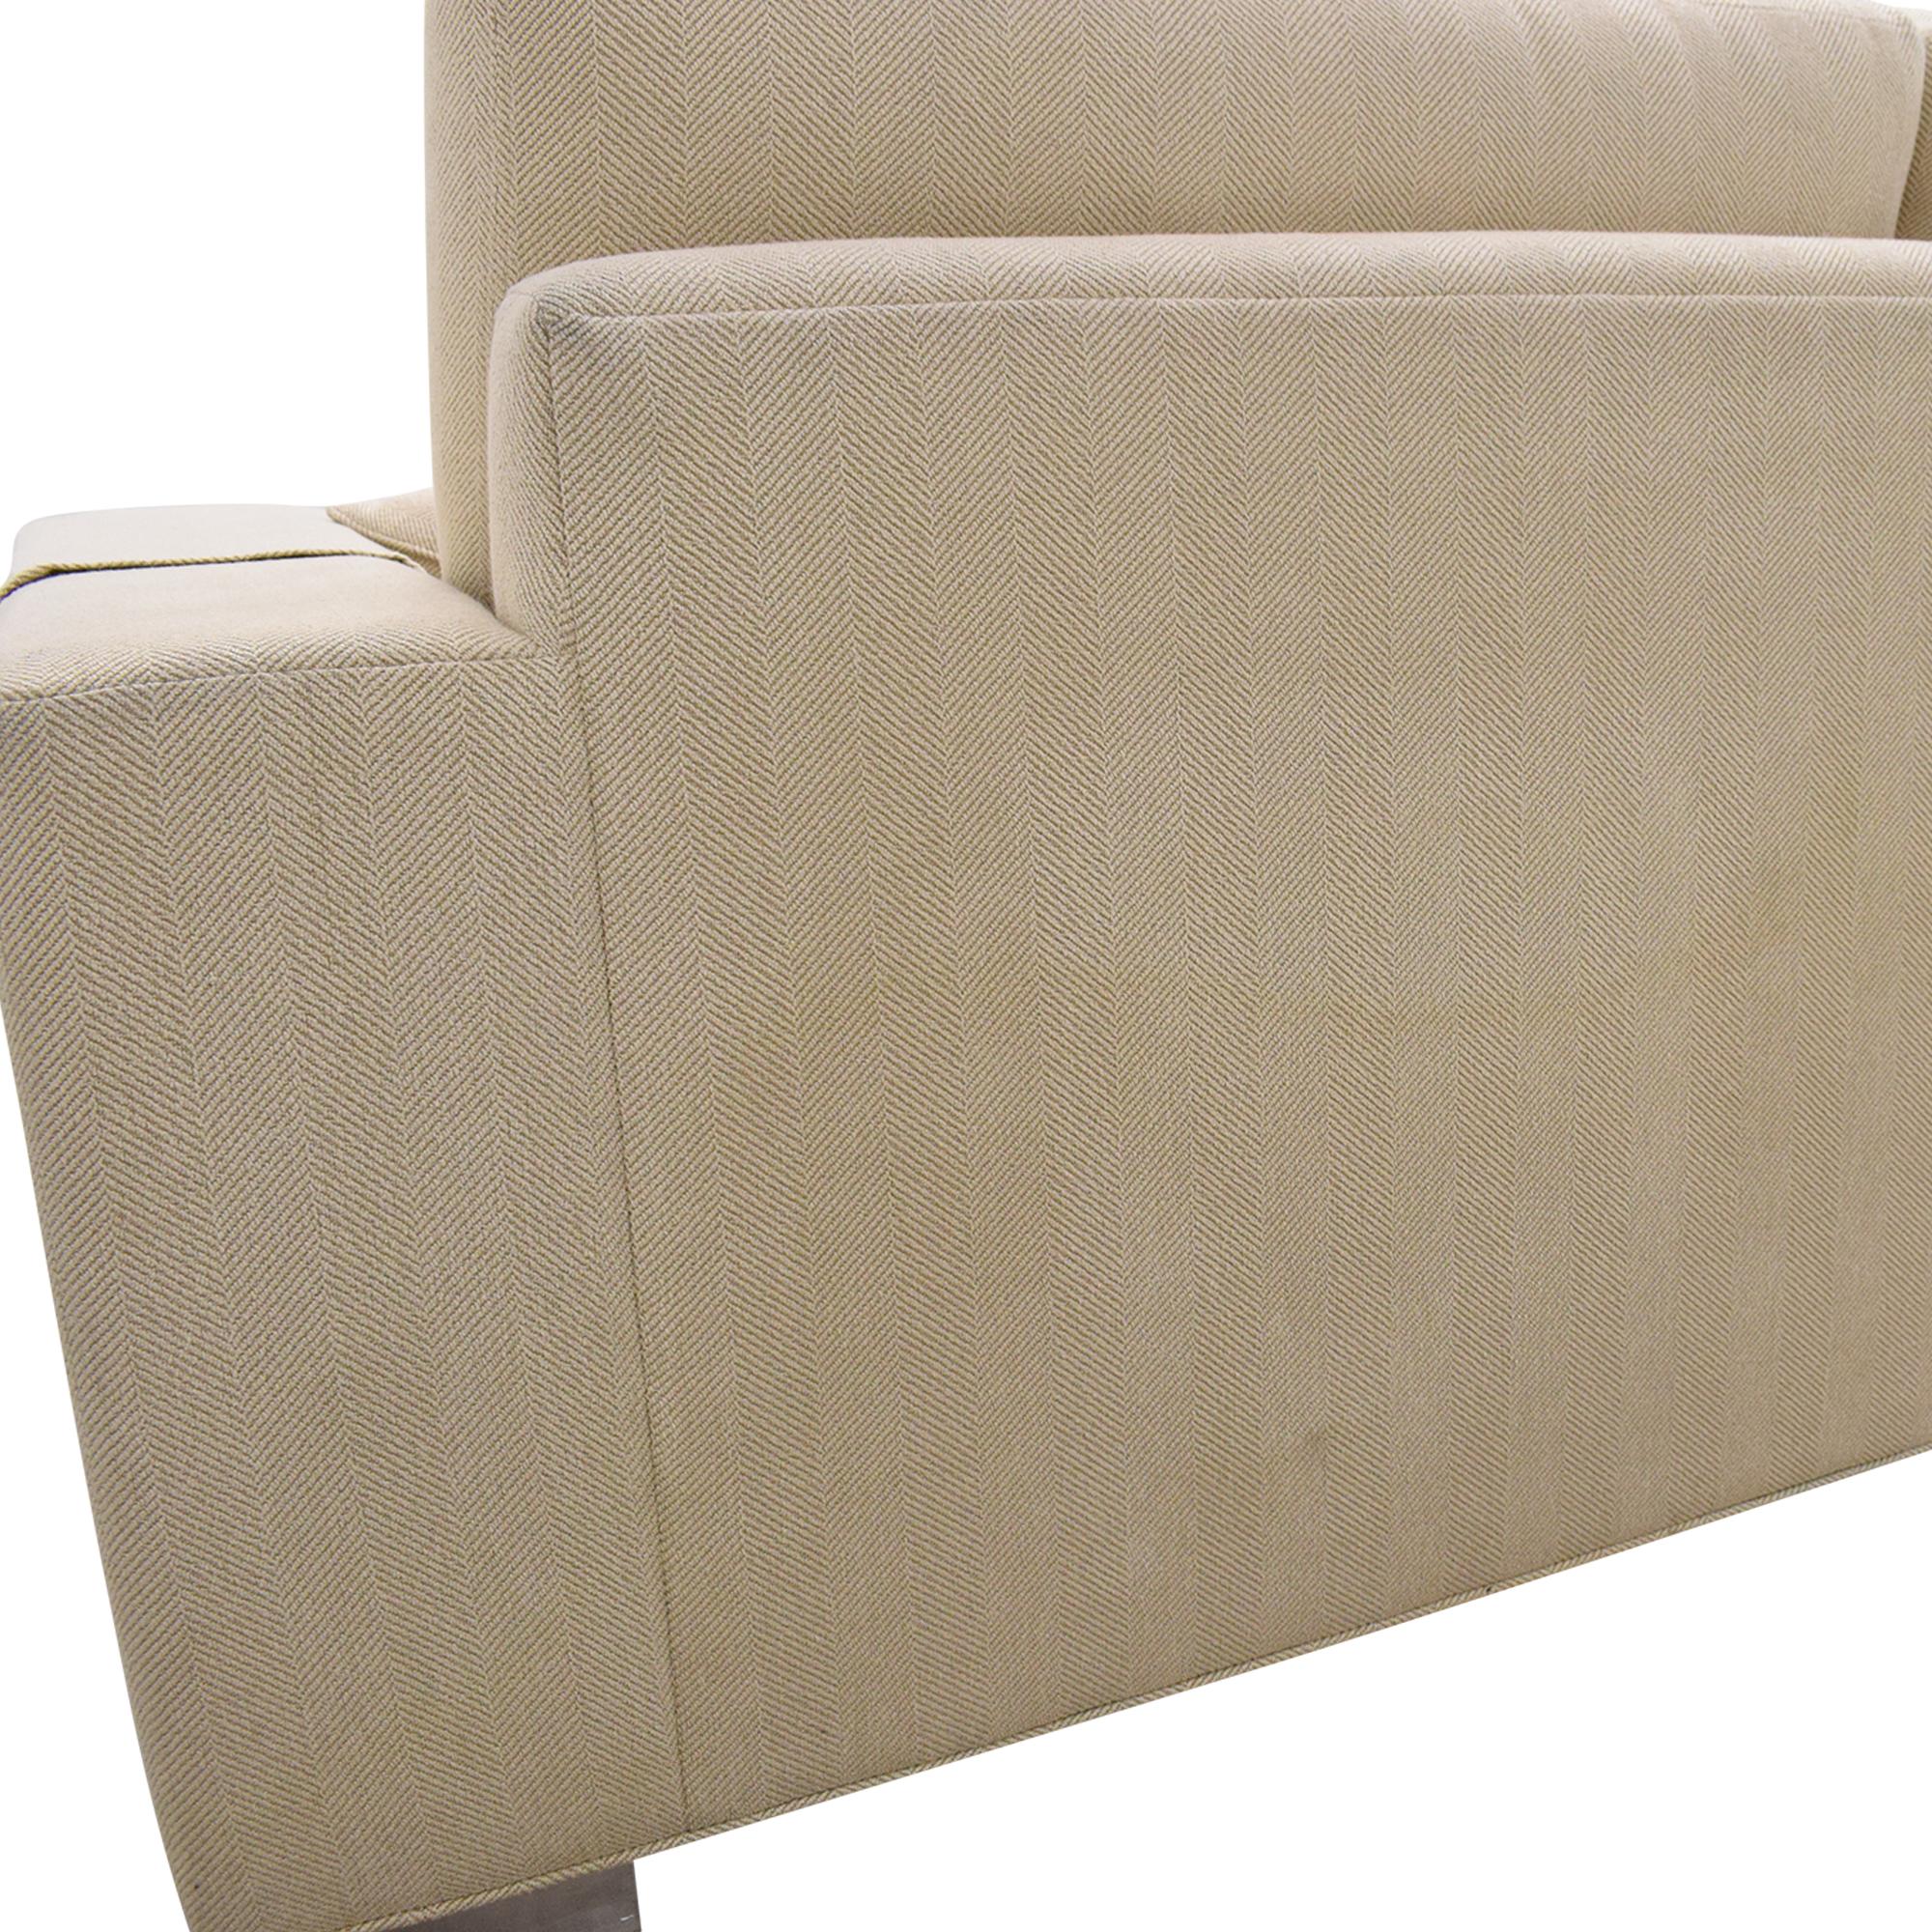 Ethan Allen Ethan Allen Conway Sectional Sofa nyc